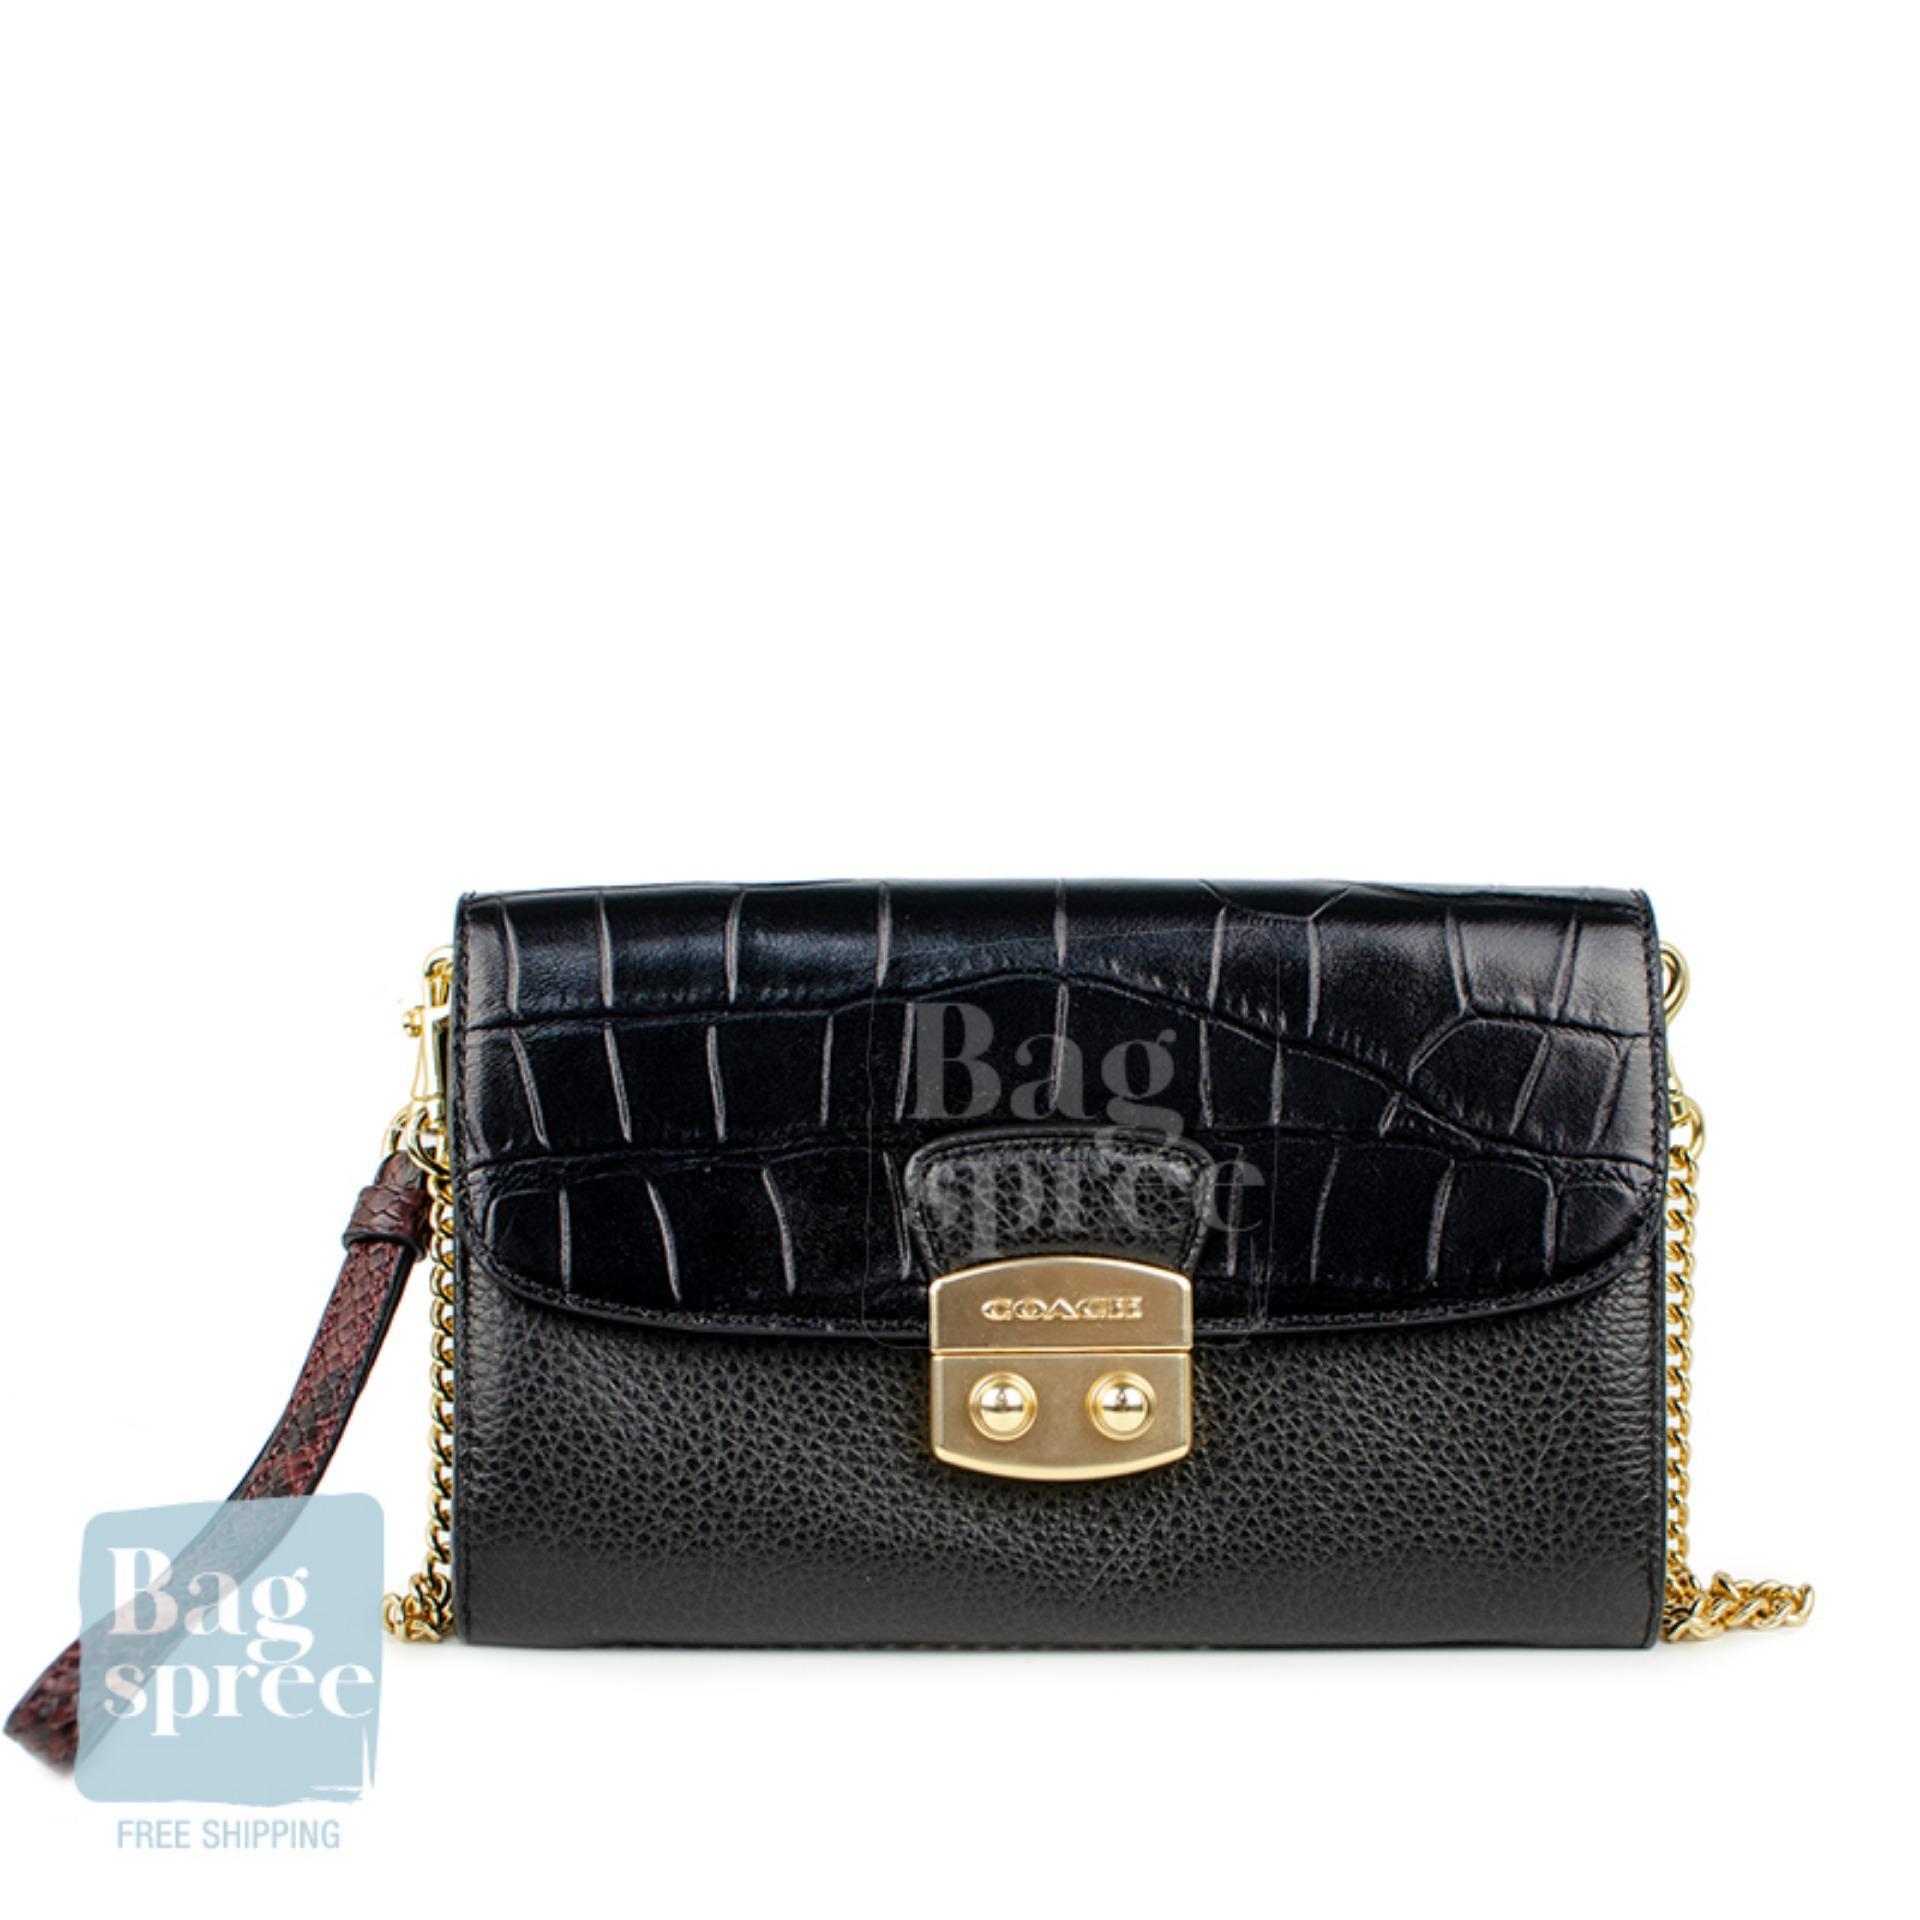 012ca6c04 *Authentic & Brand New* Coach Chain Crossbody Black Leather Bag F55617  IMBLK [Gift